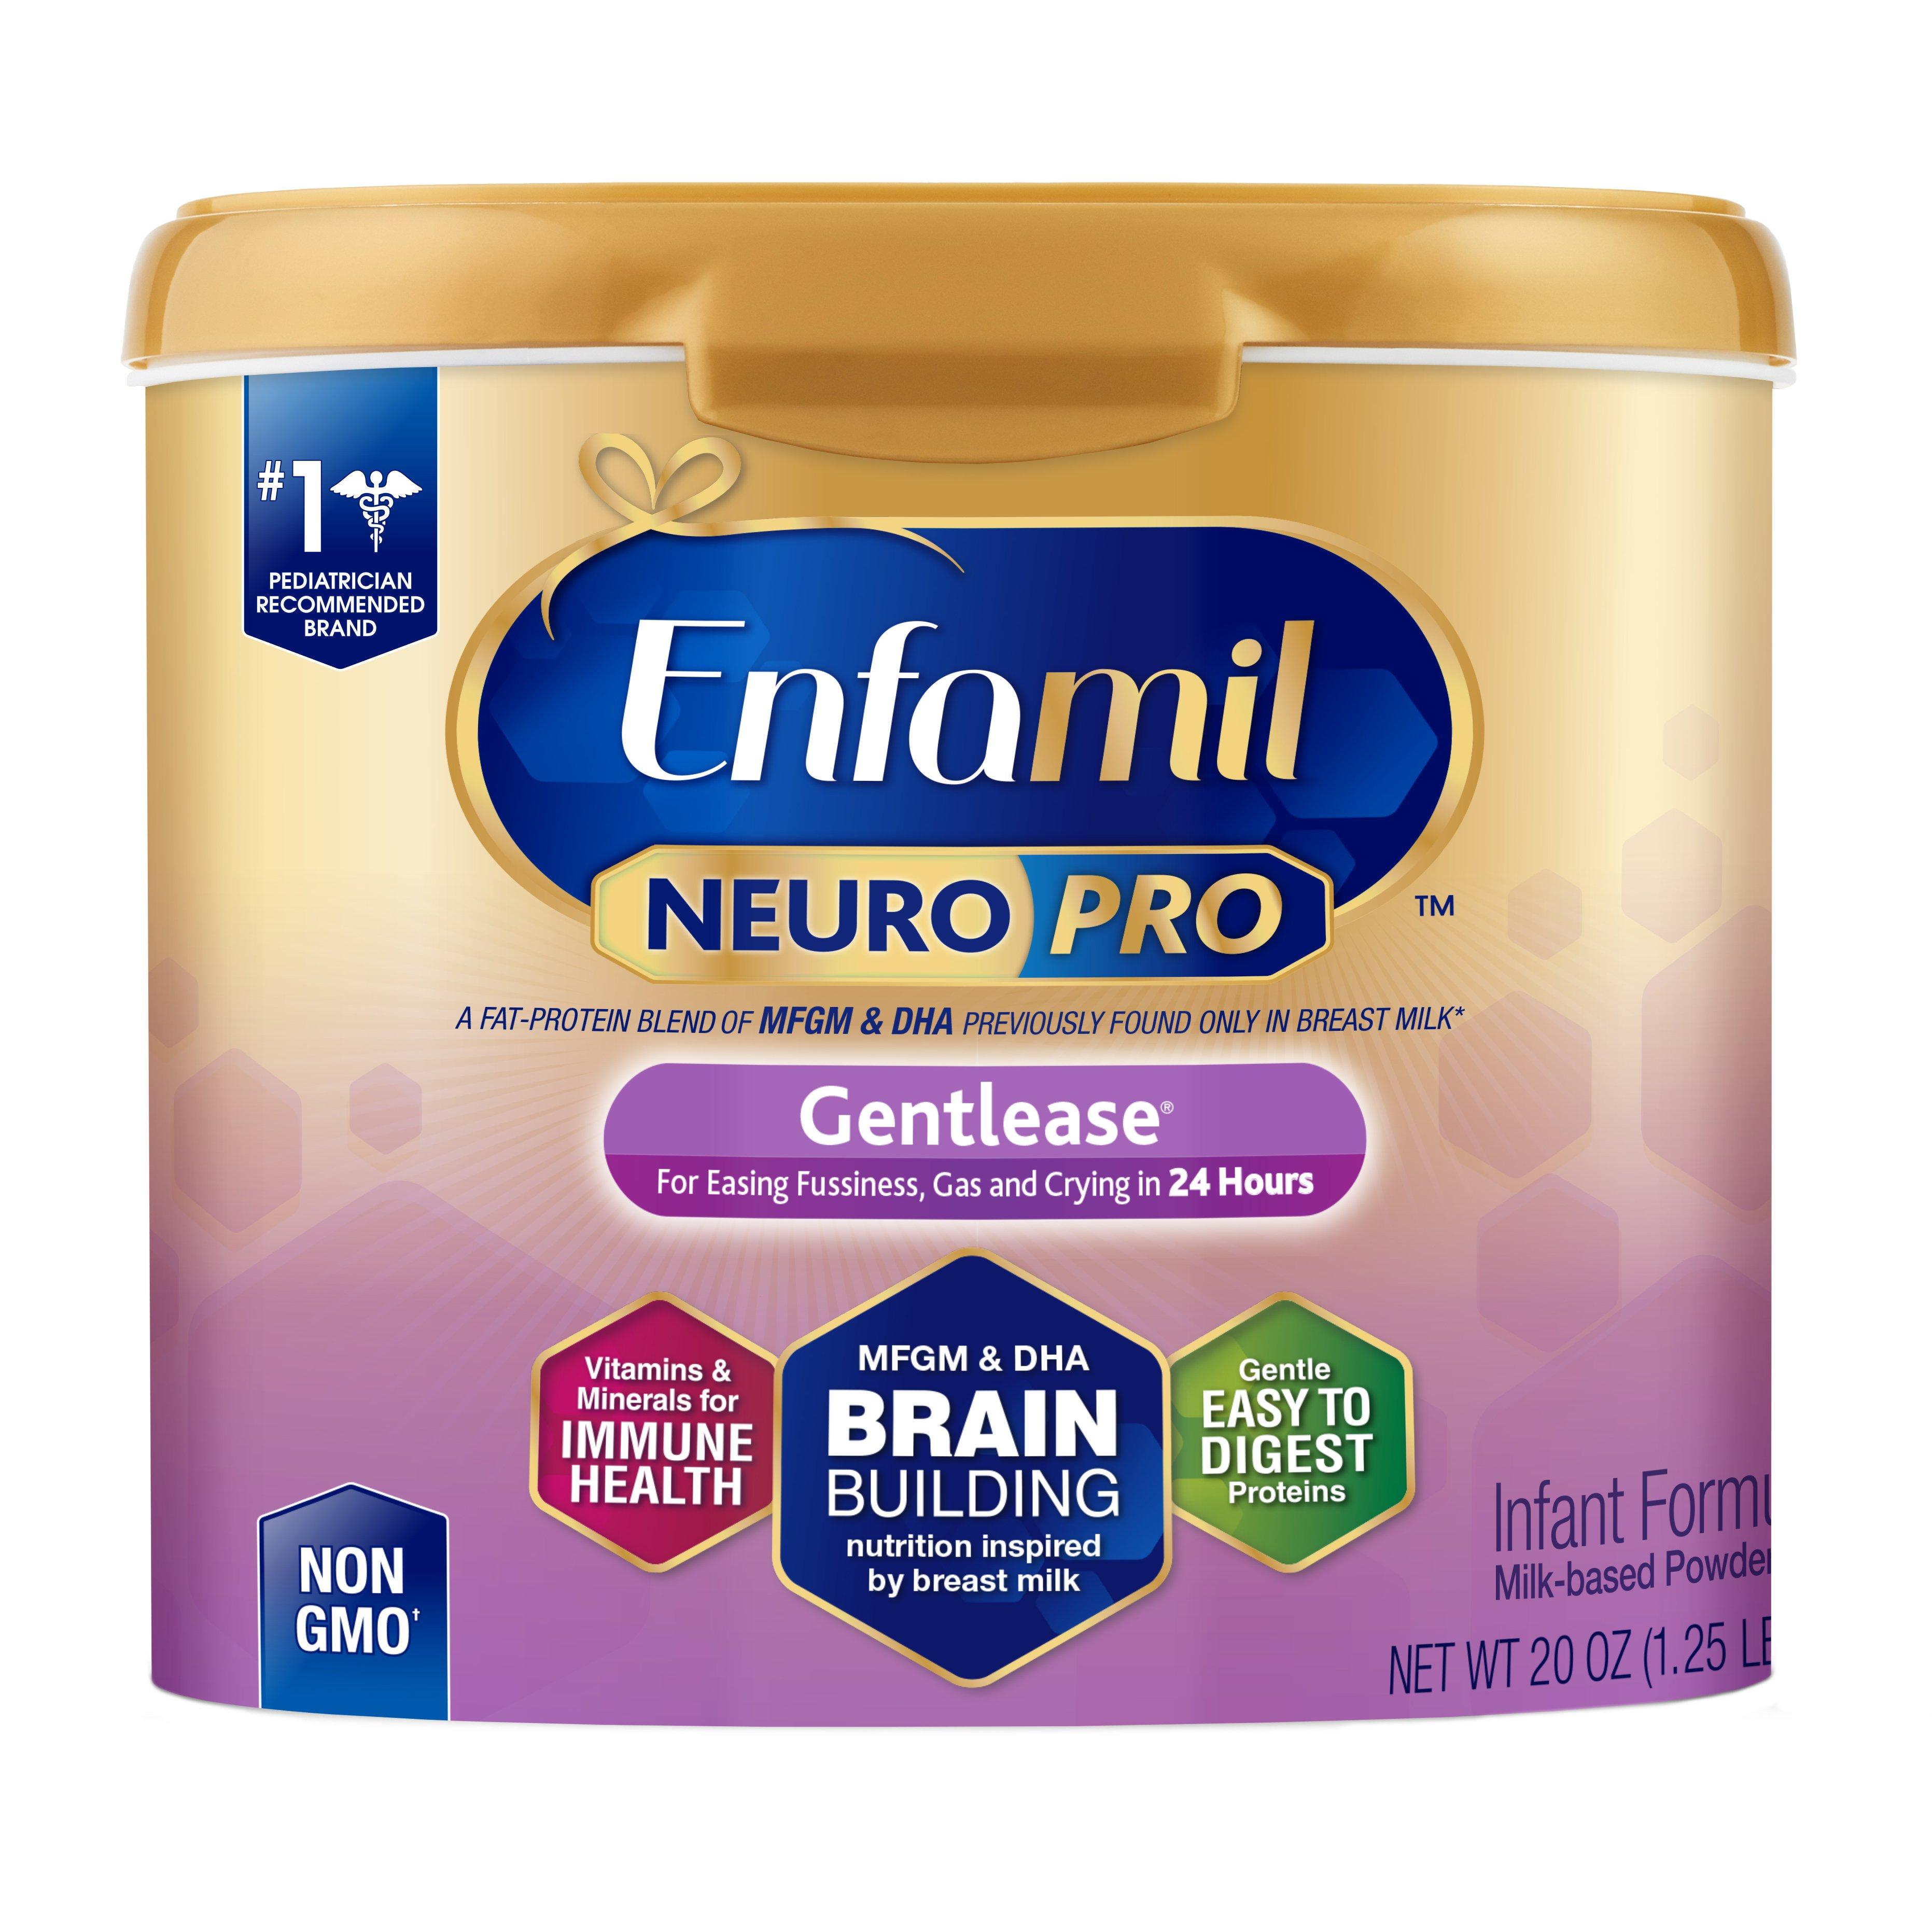 Enfamil Neuropro Gentlease Infant Formula Shop Powder At Heb